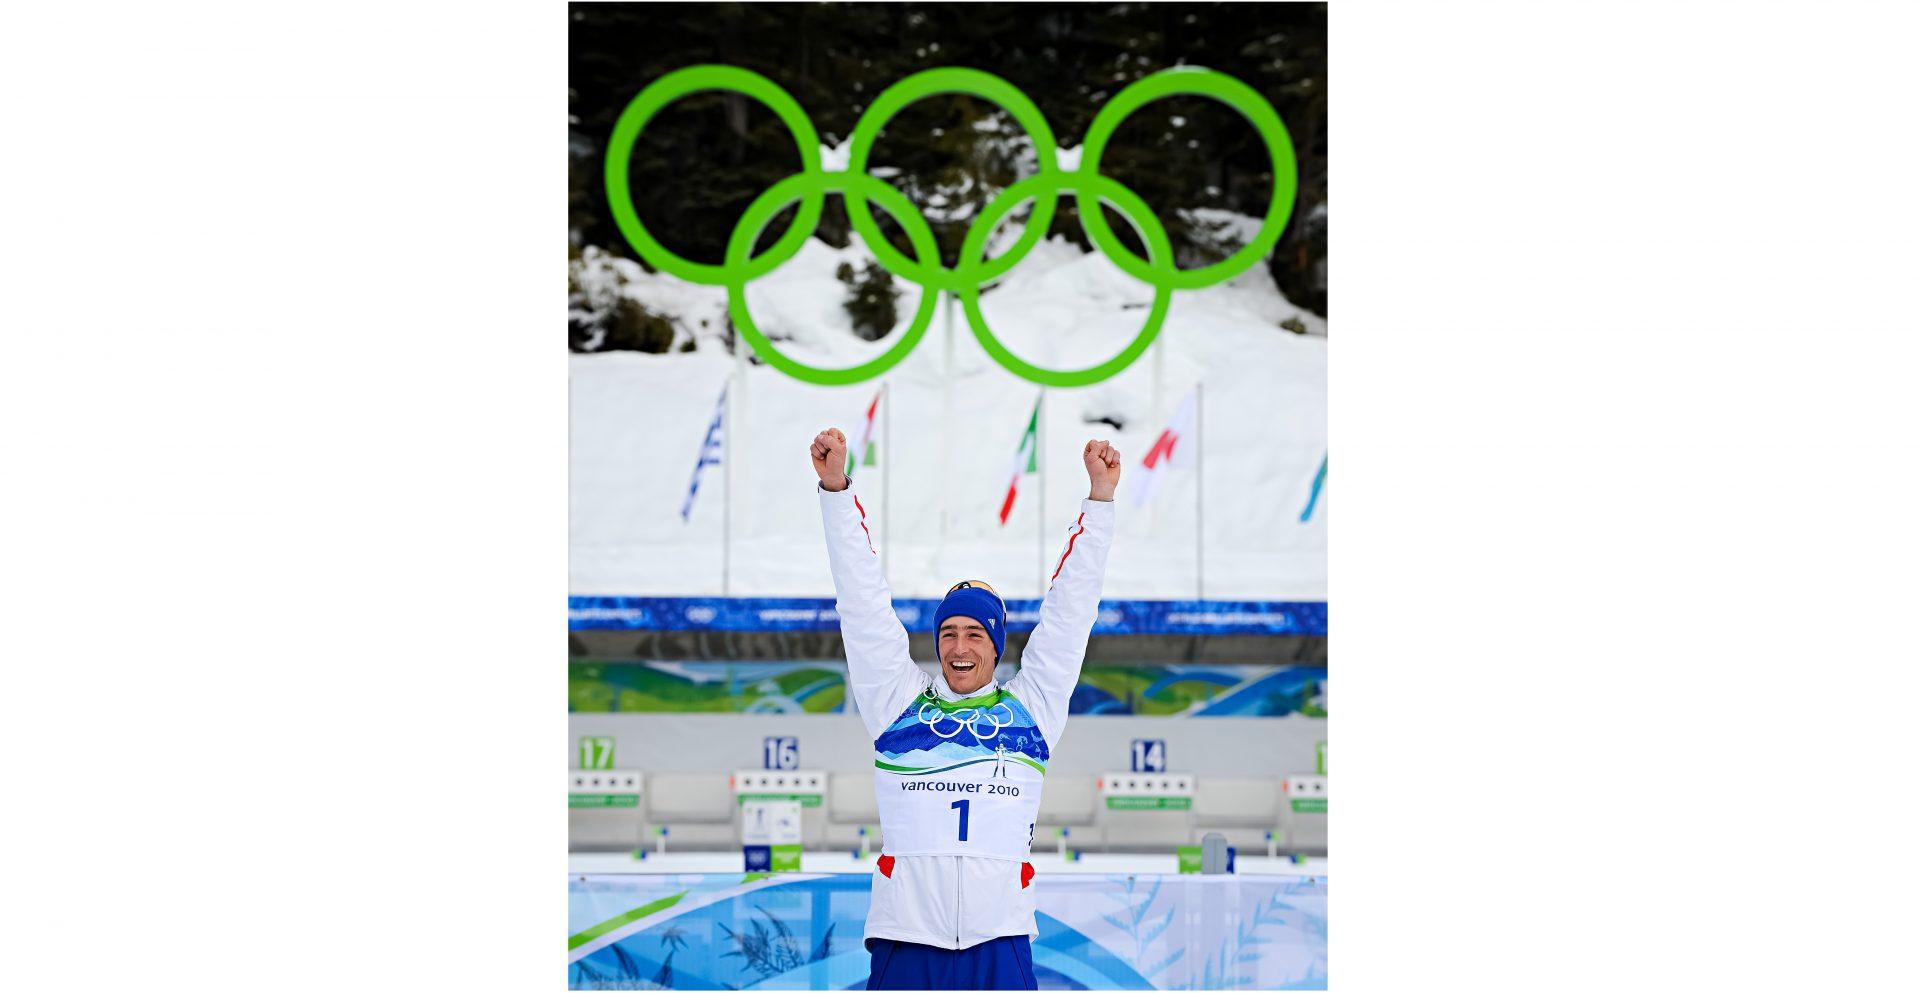 Vincent JAY, champion biathlon